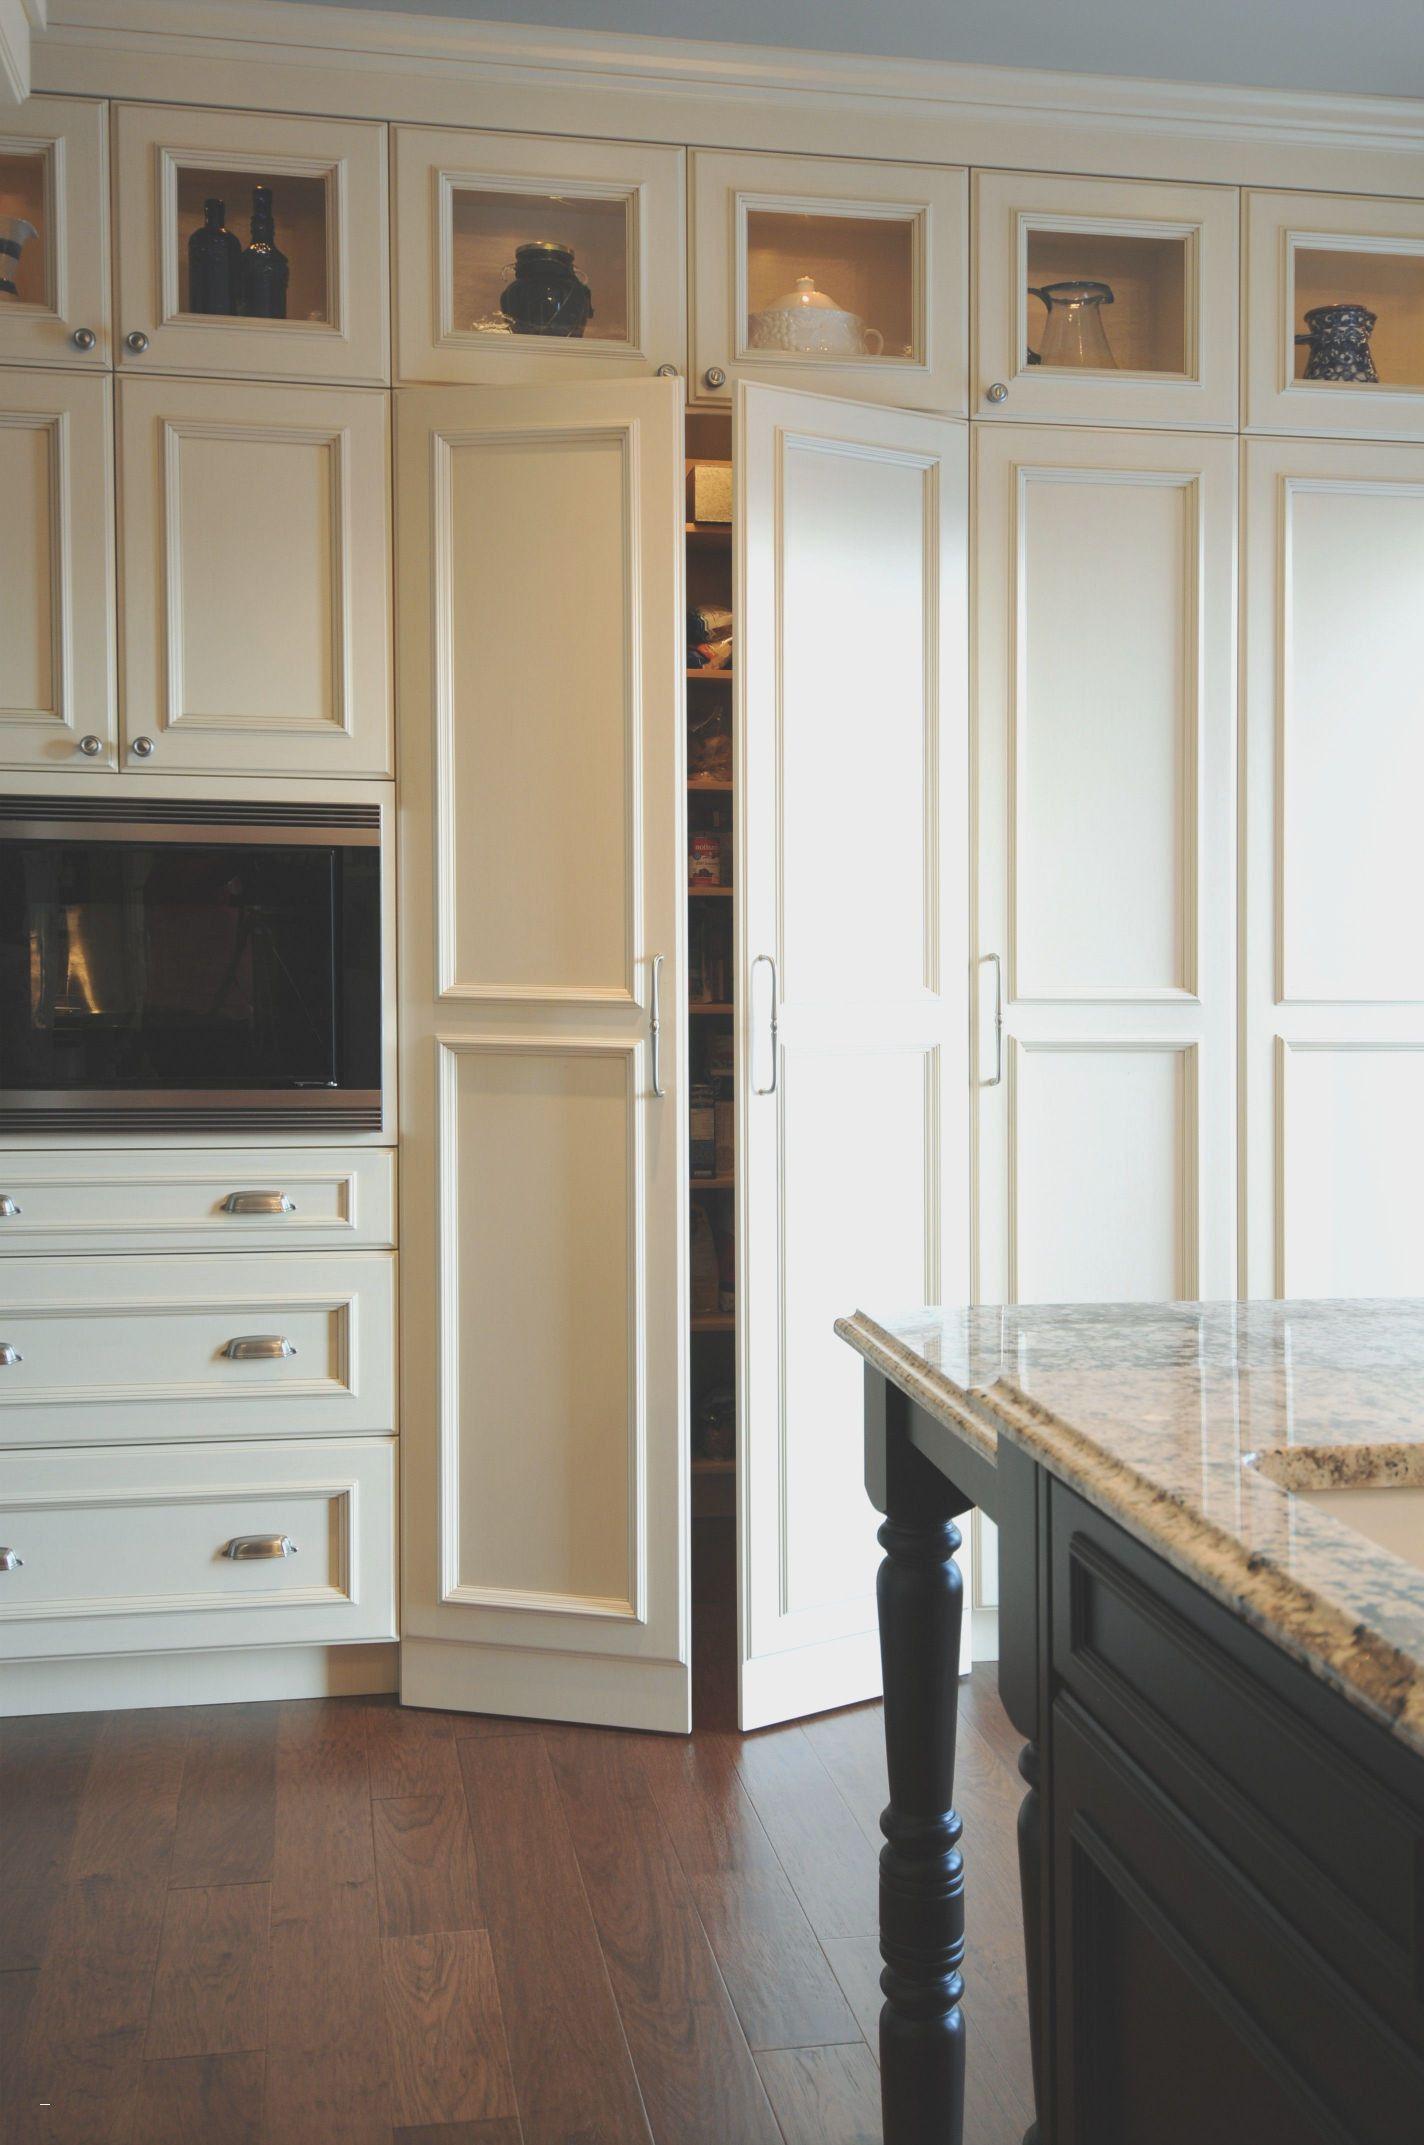 kitchen cabinet door styles luxury luxury kitchen cabinets with glass doors glass kitchen on kitchen cabinets with glass doors on top id=45821